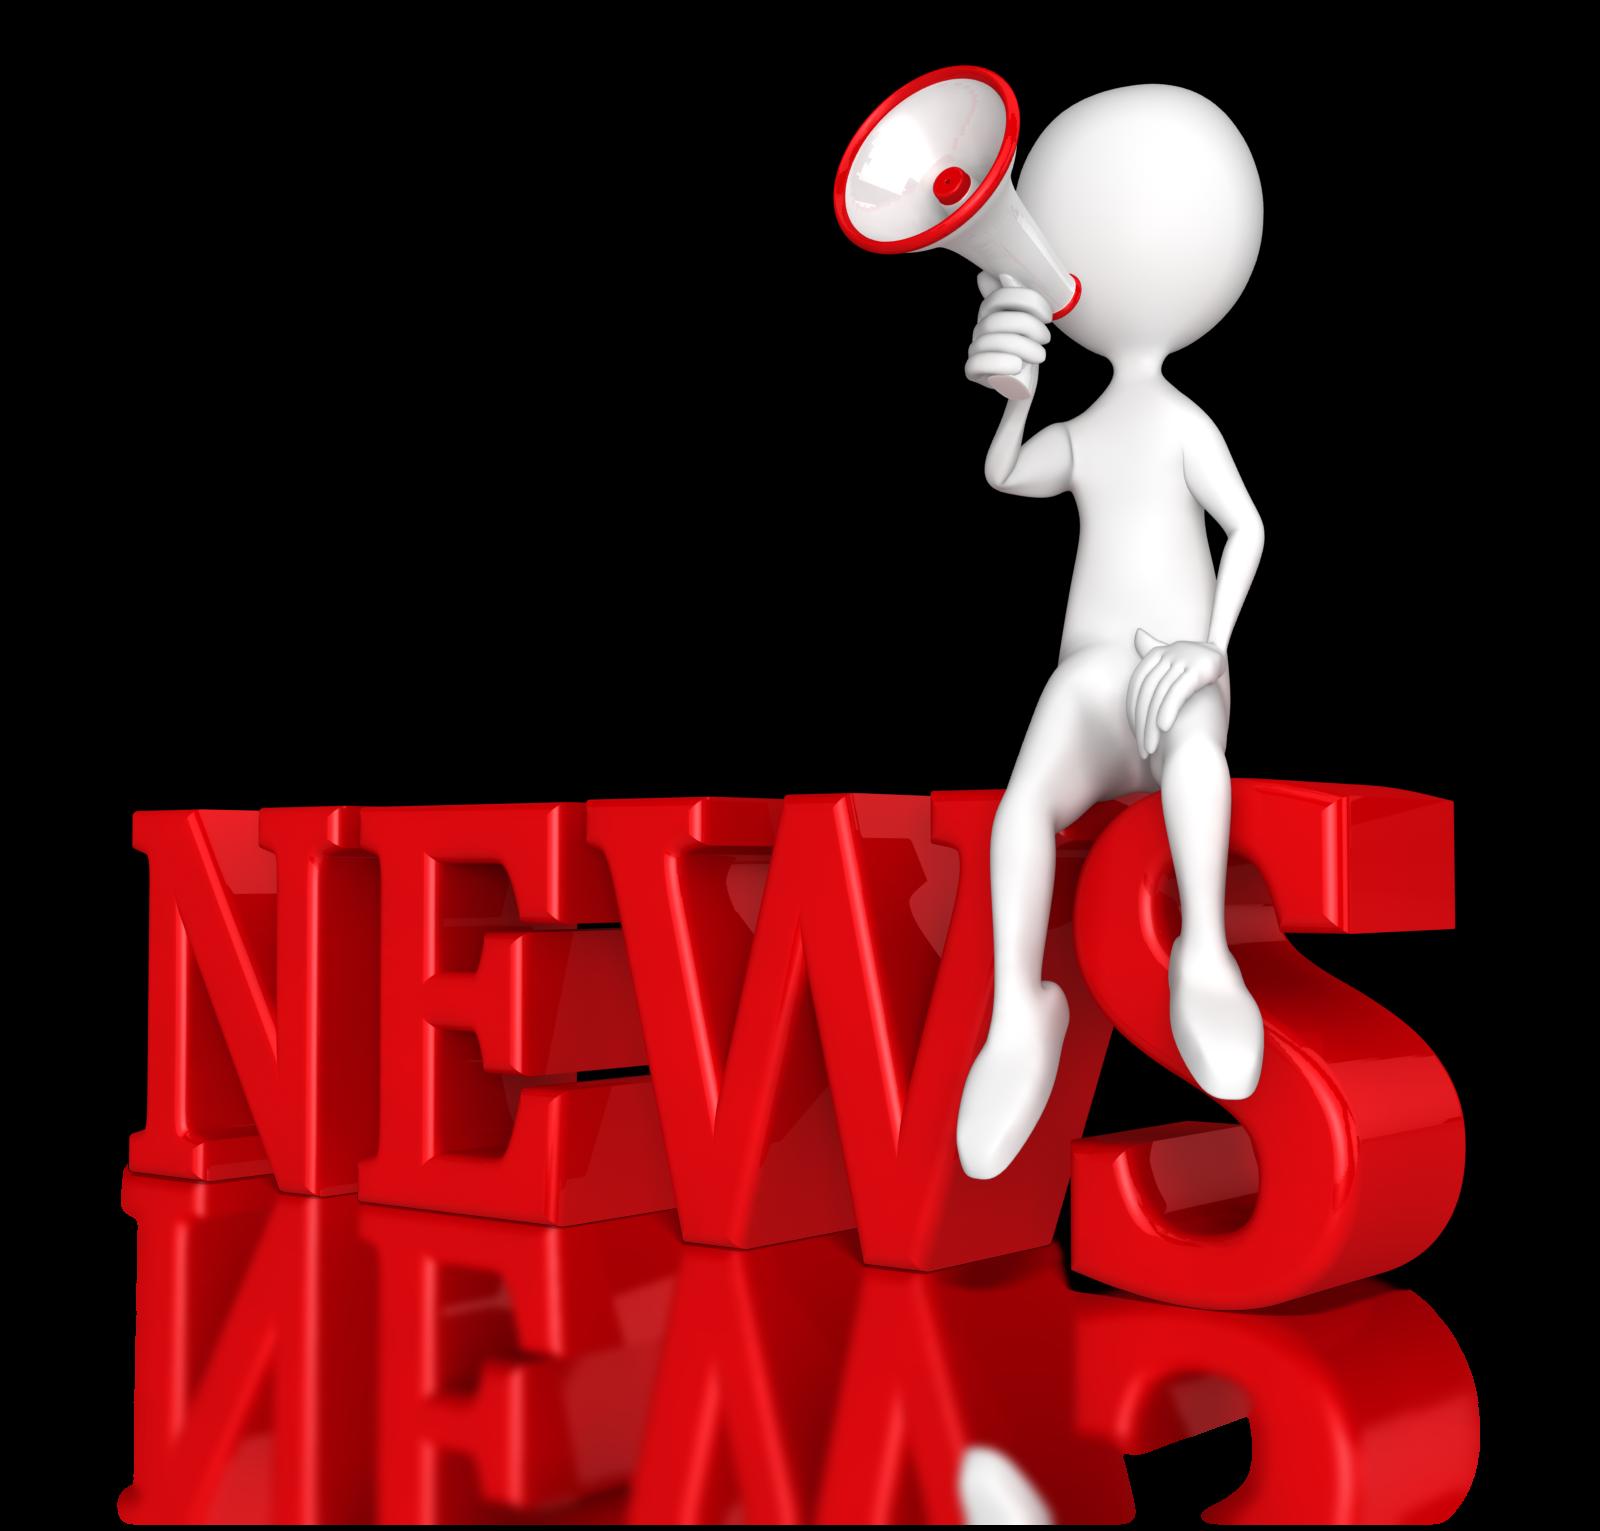 news_megaphone_1600_clr_9546